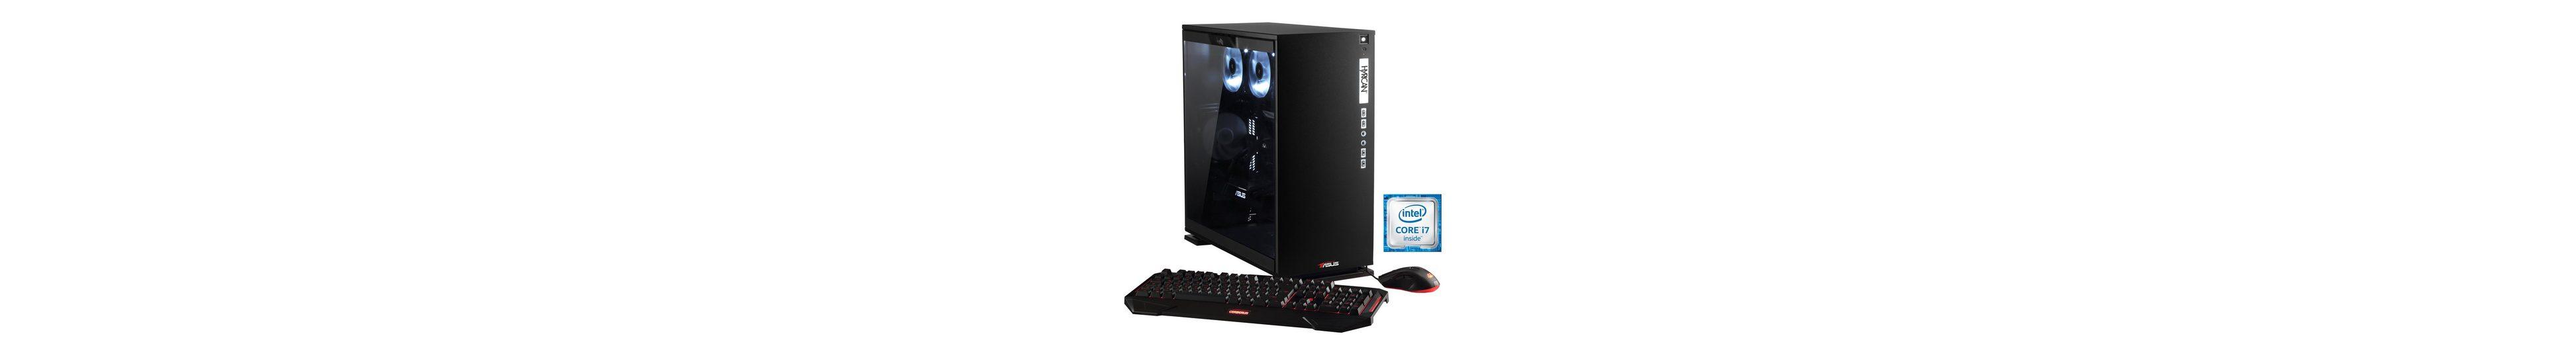 Hyrican Gaming PC Intel® i7-6850K, 32GB, GeForce® GTX 1080 »Elegance 5331 blanc - powered by ASUS«